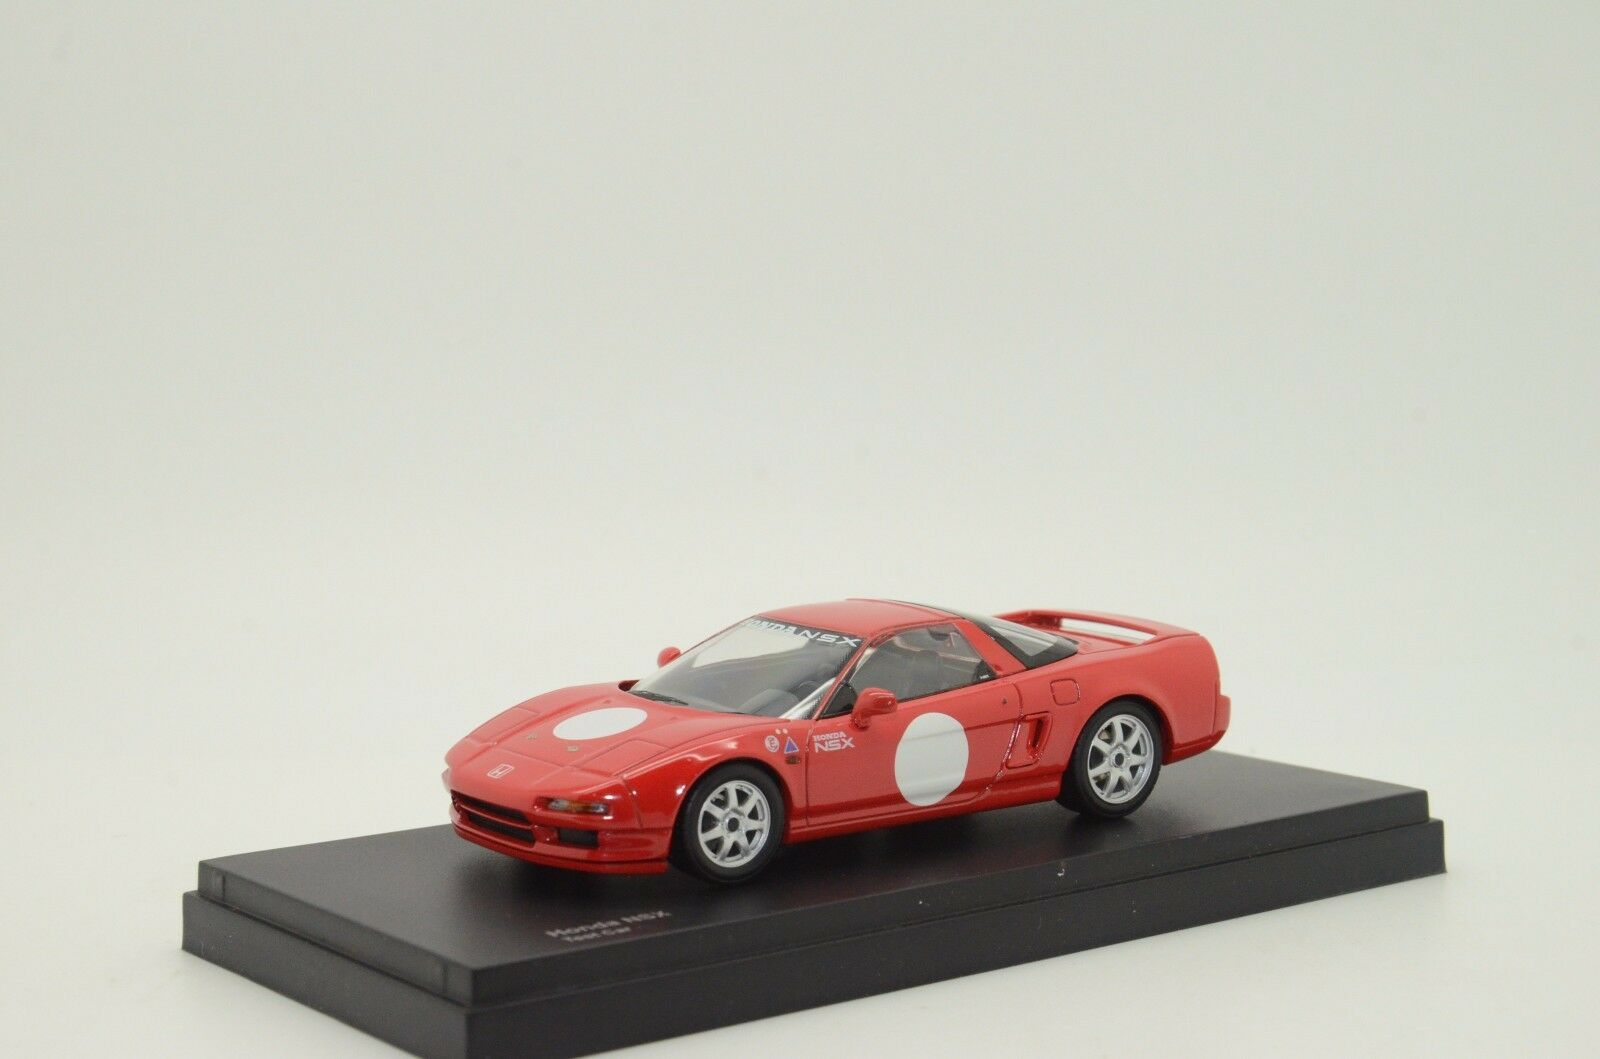 Honda NSX Test Car Kyosho 03327A 1 43